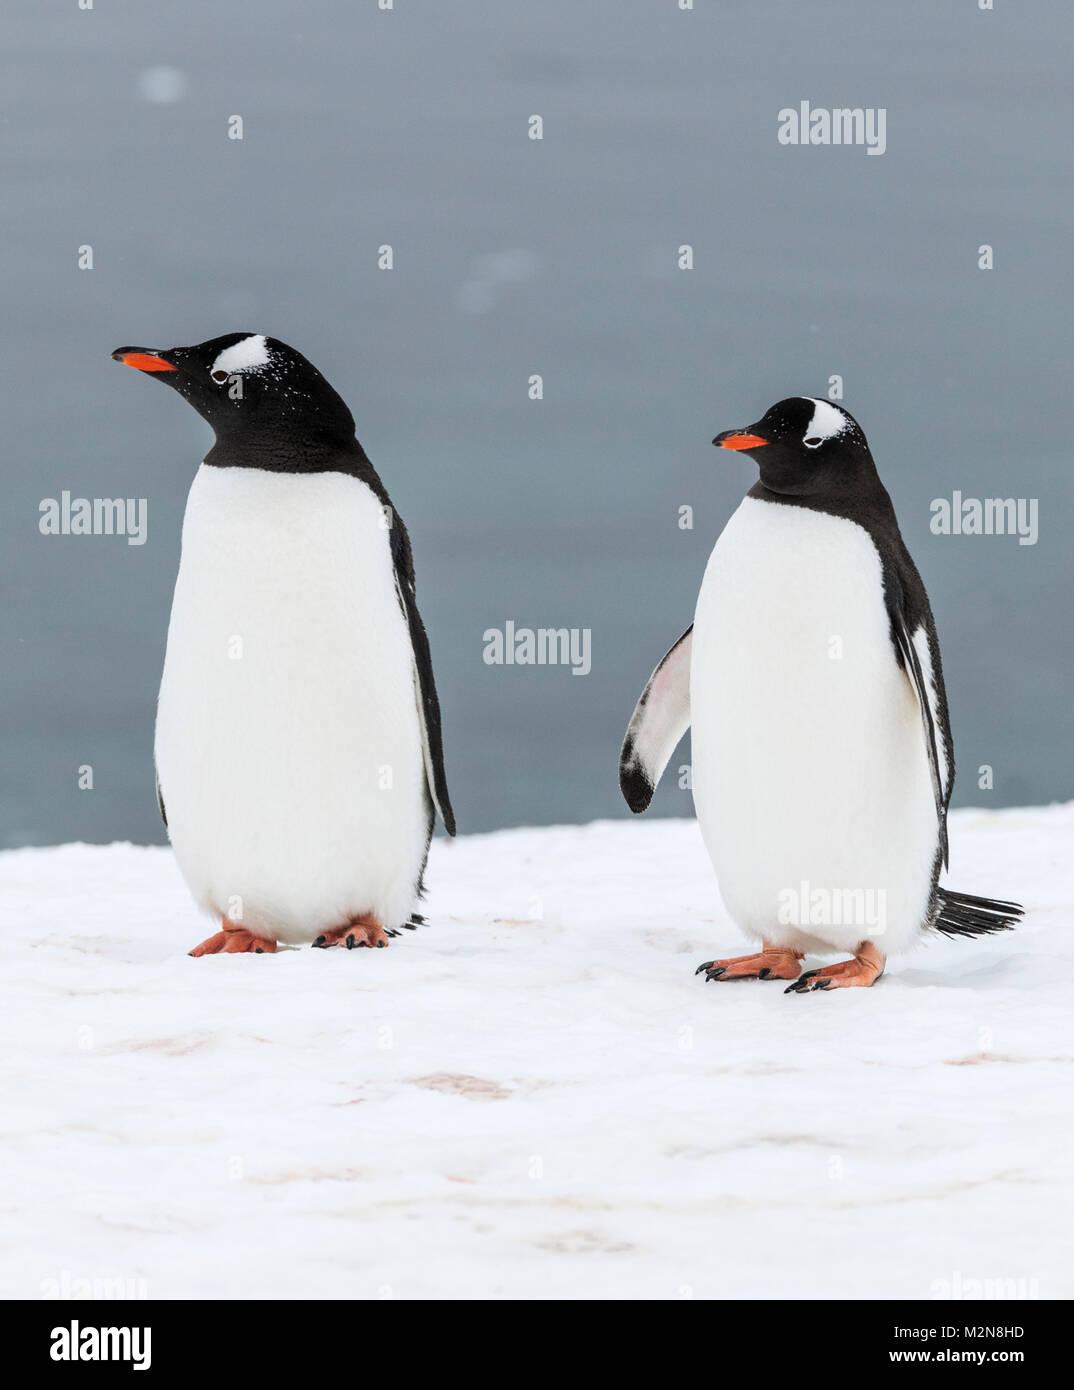 Long-tailed Gentoo penguin; Pygoscelis papua; Cuverville Island; Antarctica - Stock Image